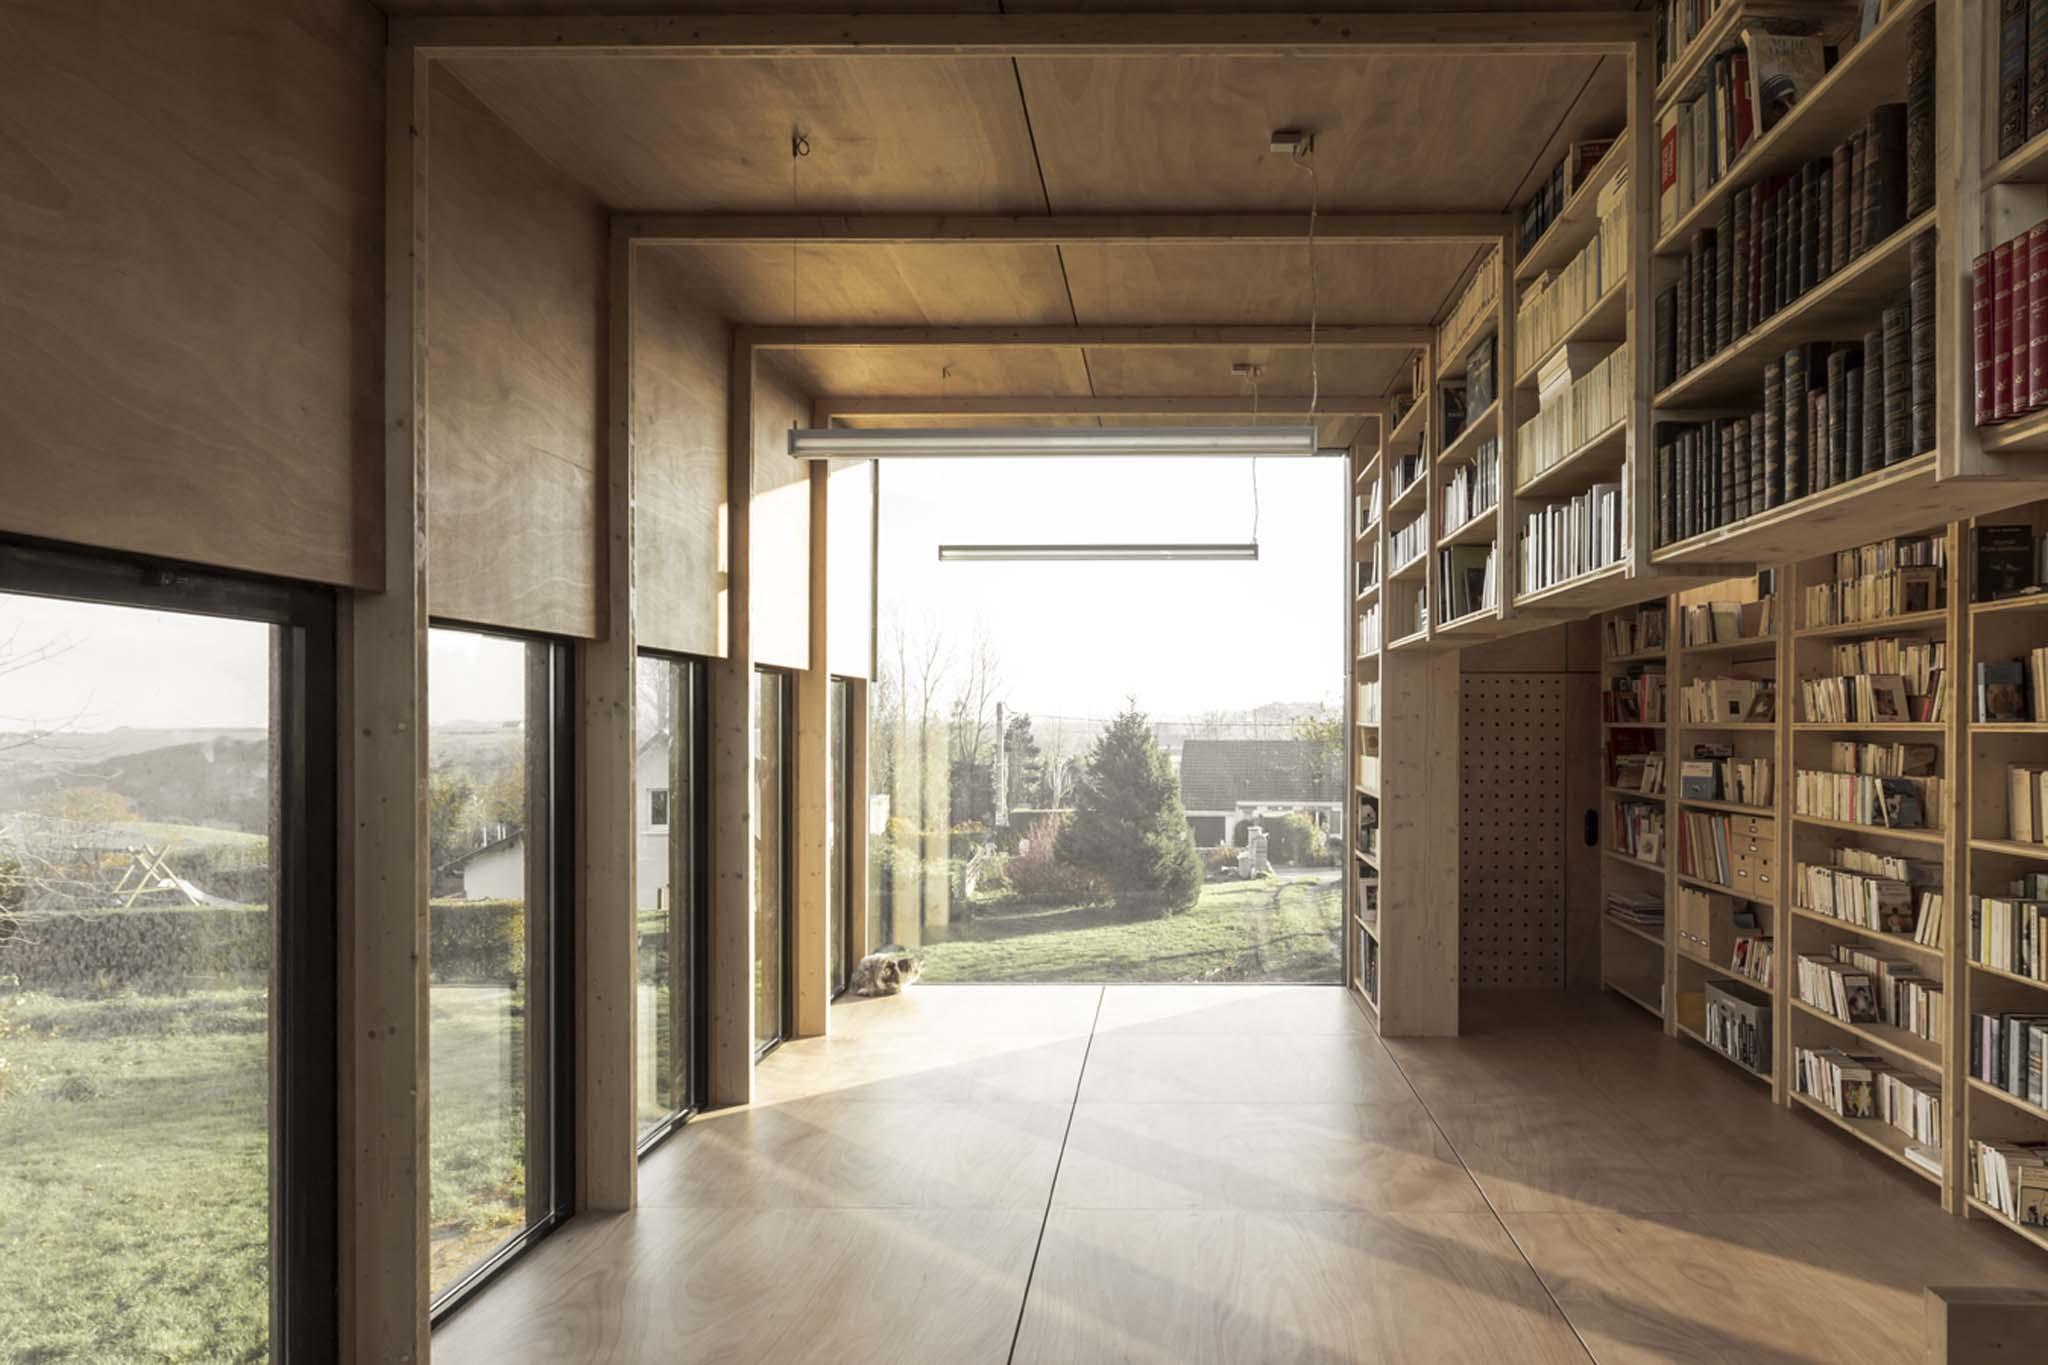 antonin ziegler extension de biblioth que nomin e au prix de la premi re uvre 2015. Black Bedroom Furniture Sets. Home Design Ideas